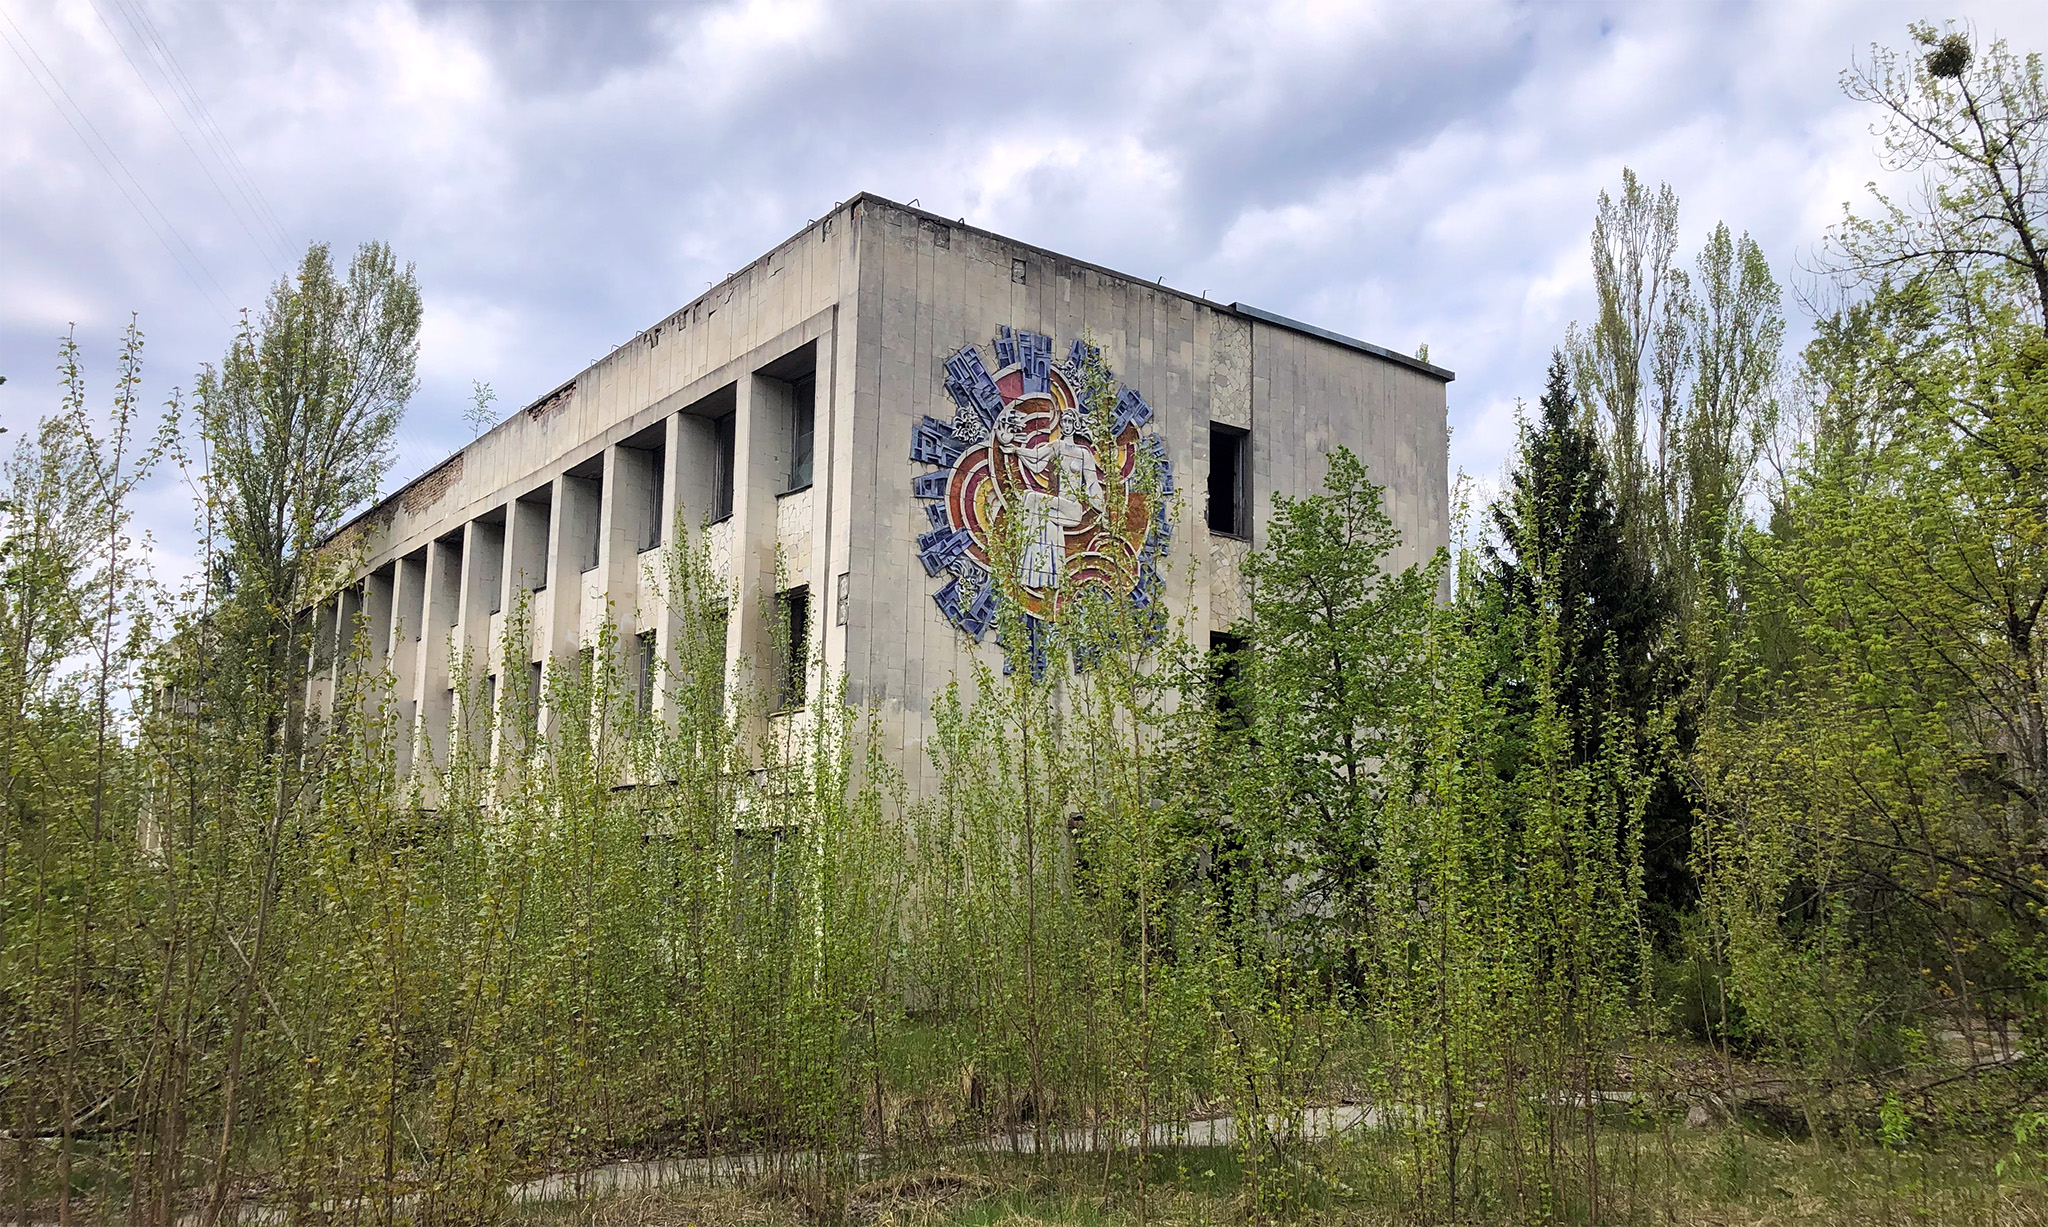 Visitar Chernóbil - Visitar Chernobyl Ucrania Ukraine Pripyat visitar chernóbil - 32891479827 5a6b33f29e o - Visitar Chernóbil: el lugar más contaminado del planeta